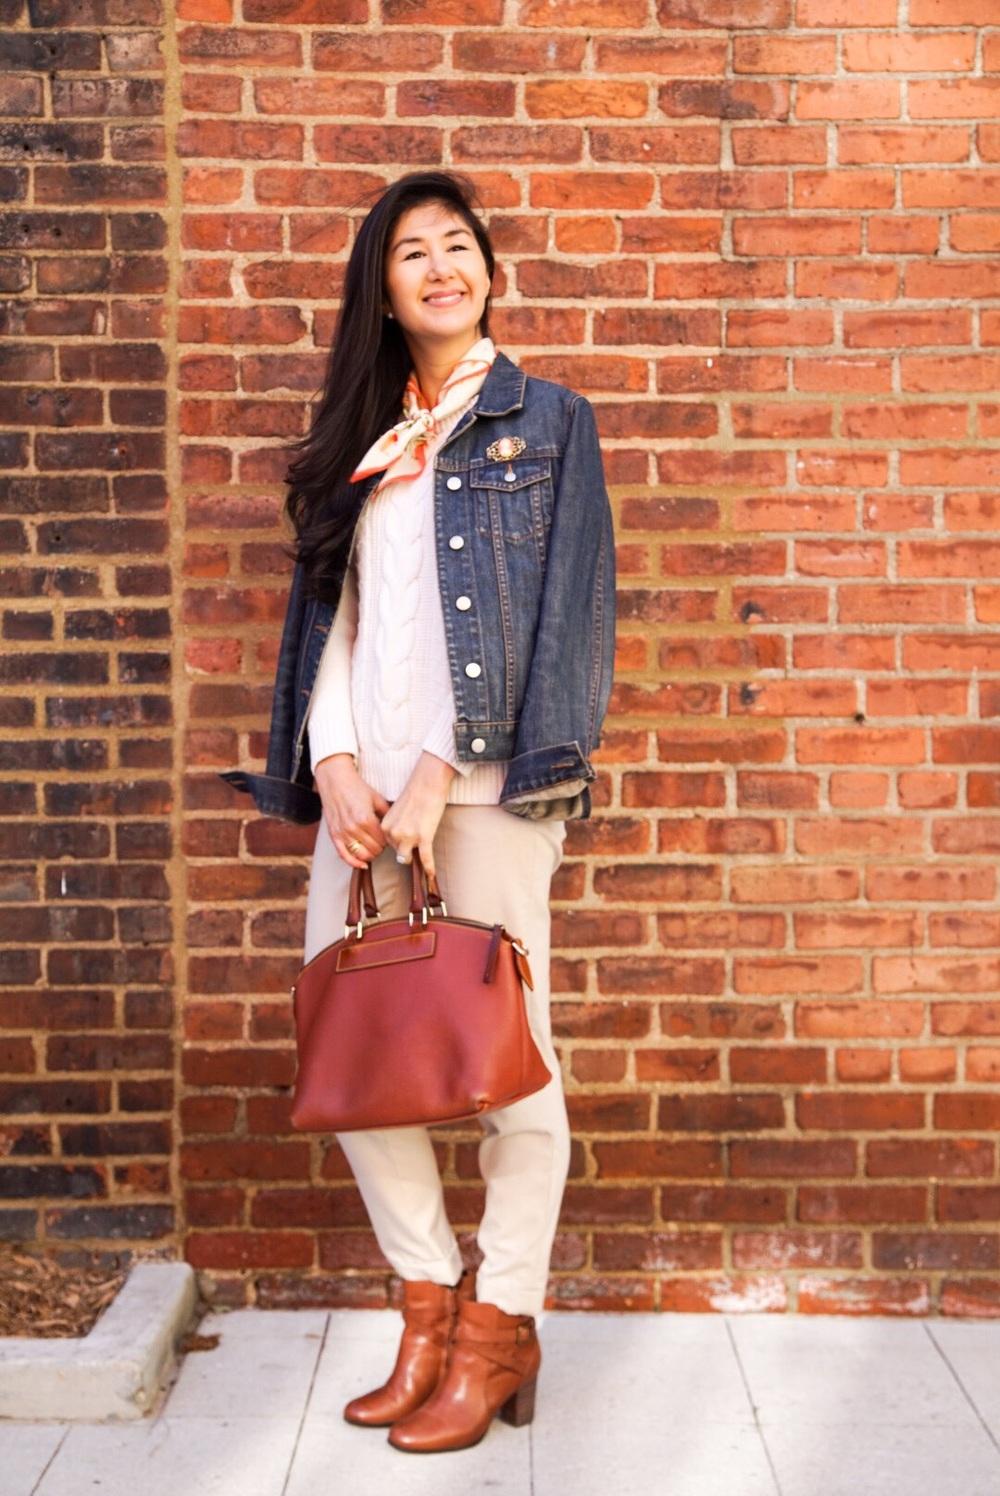 LL Bean Cable Knit Sweater Zara Pants Cole Haan Ankle Booties Dooney & Bourke Purse Ralph Lauren Silk Scarf J Crew Denim Jacket 7.jpg